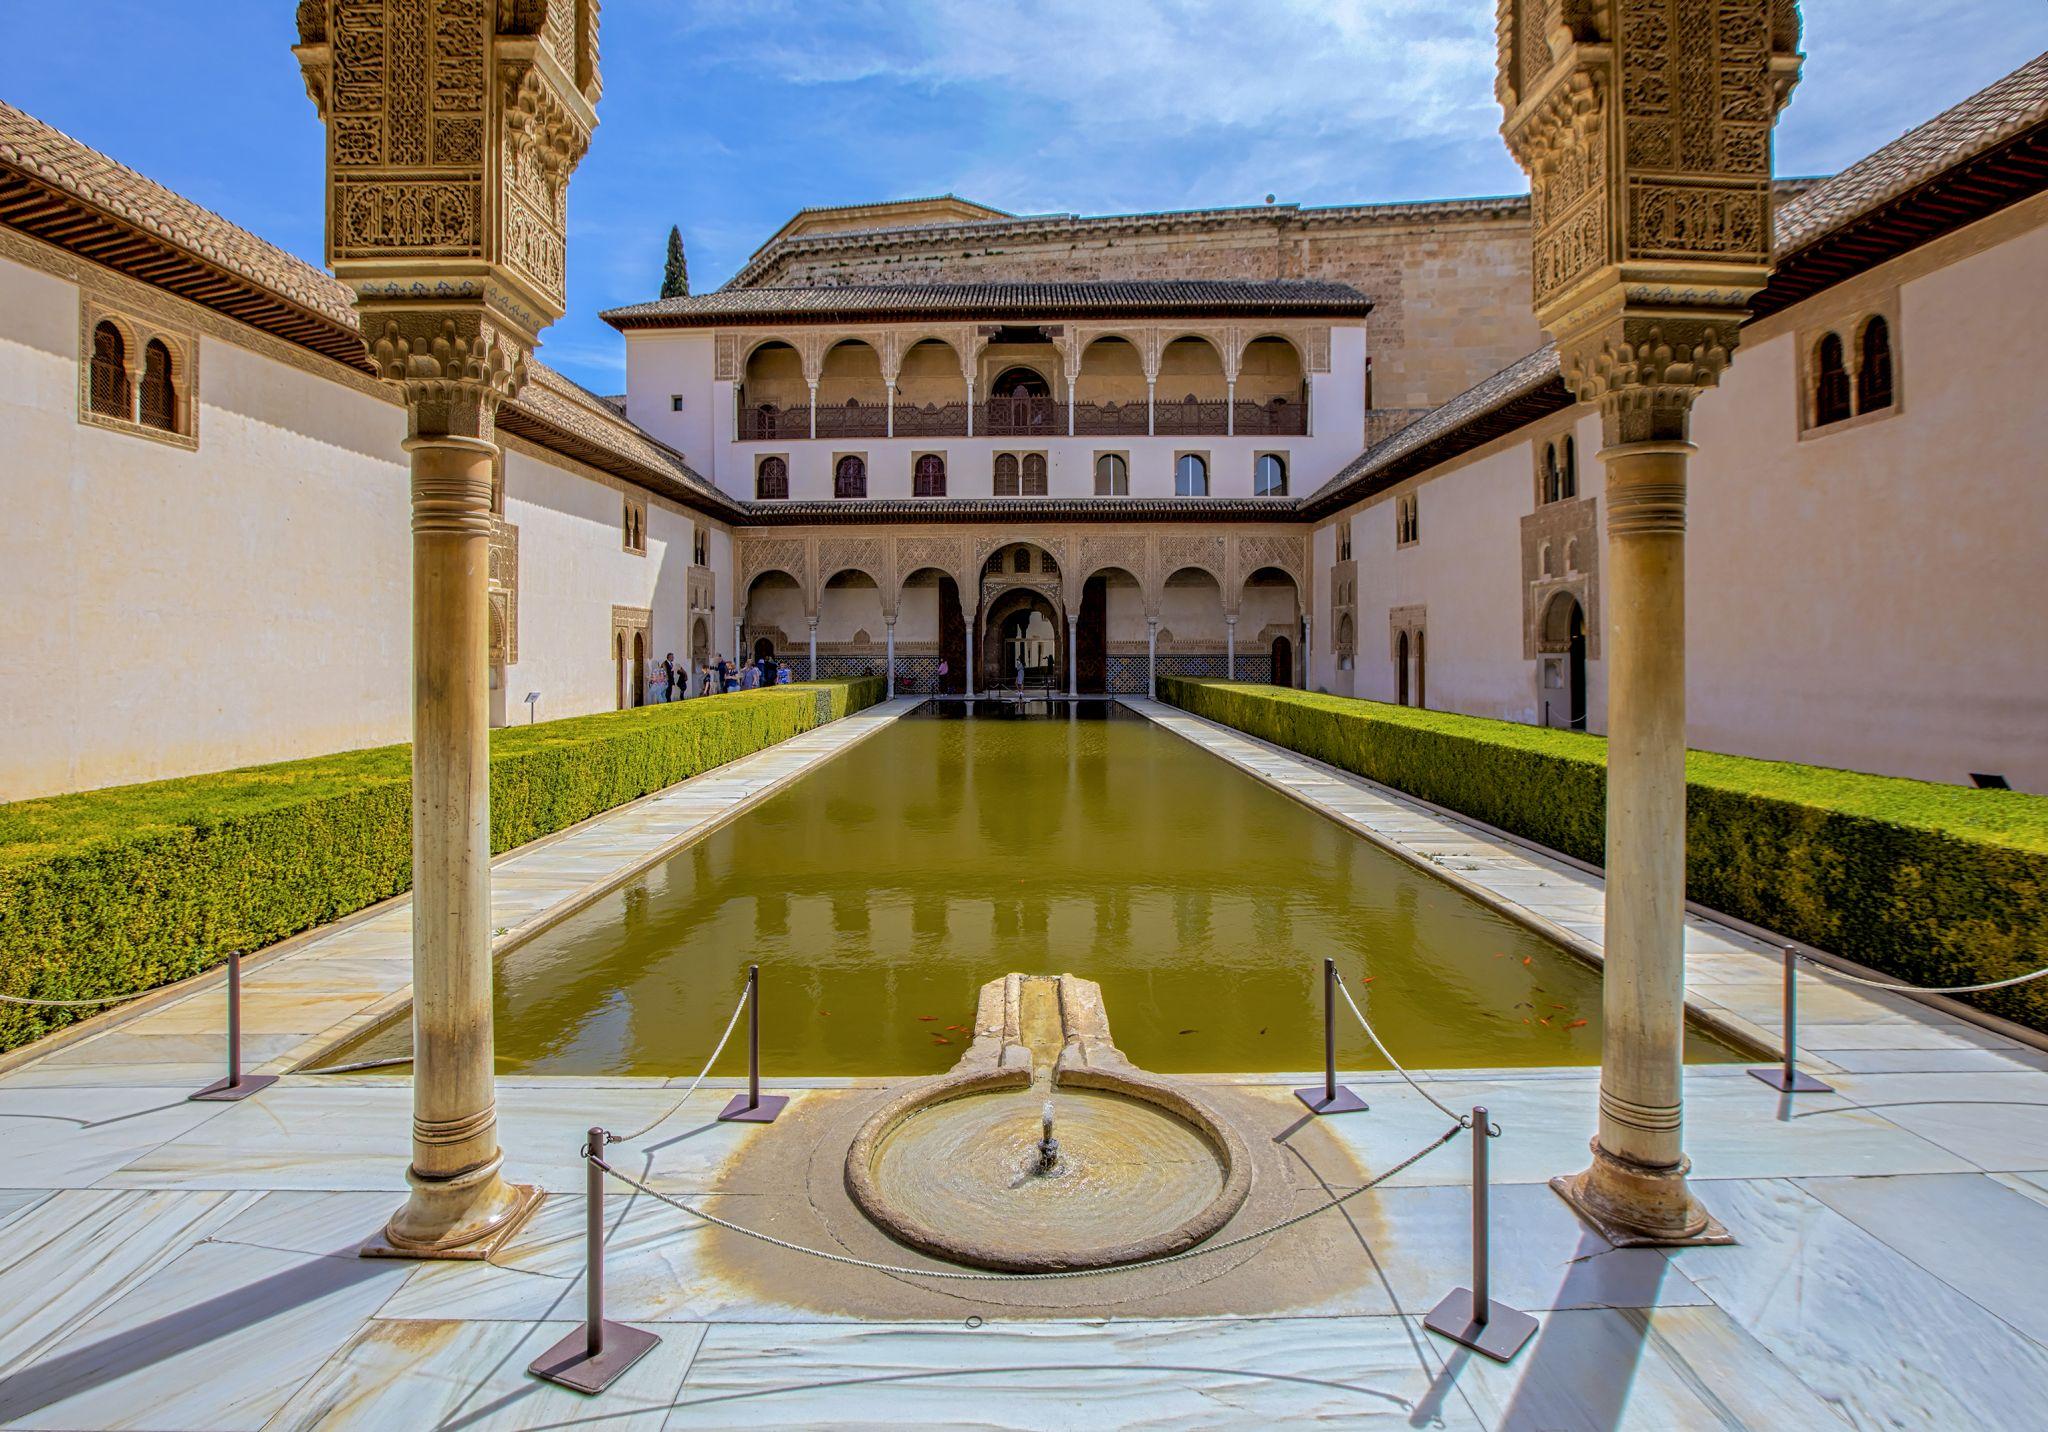 Nasrid Palace, Spain